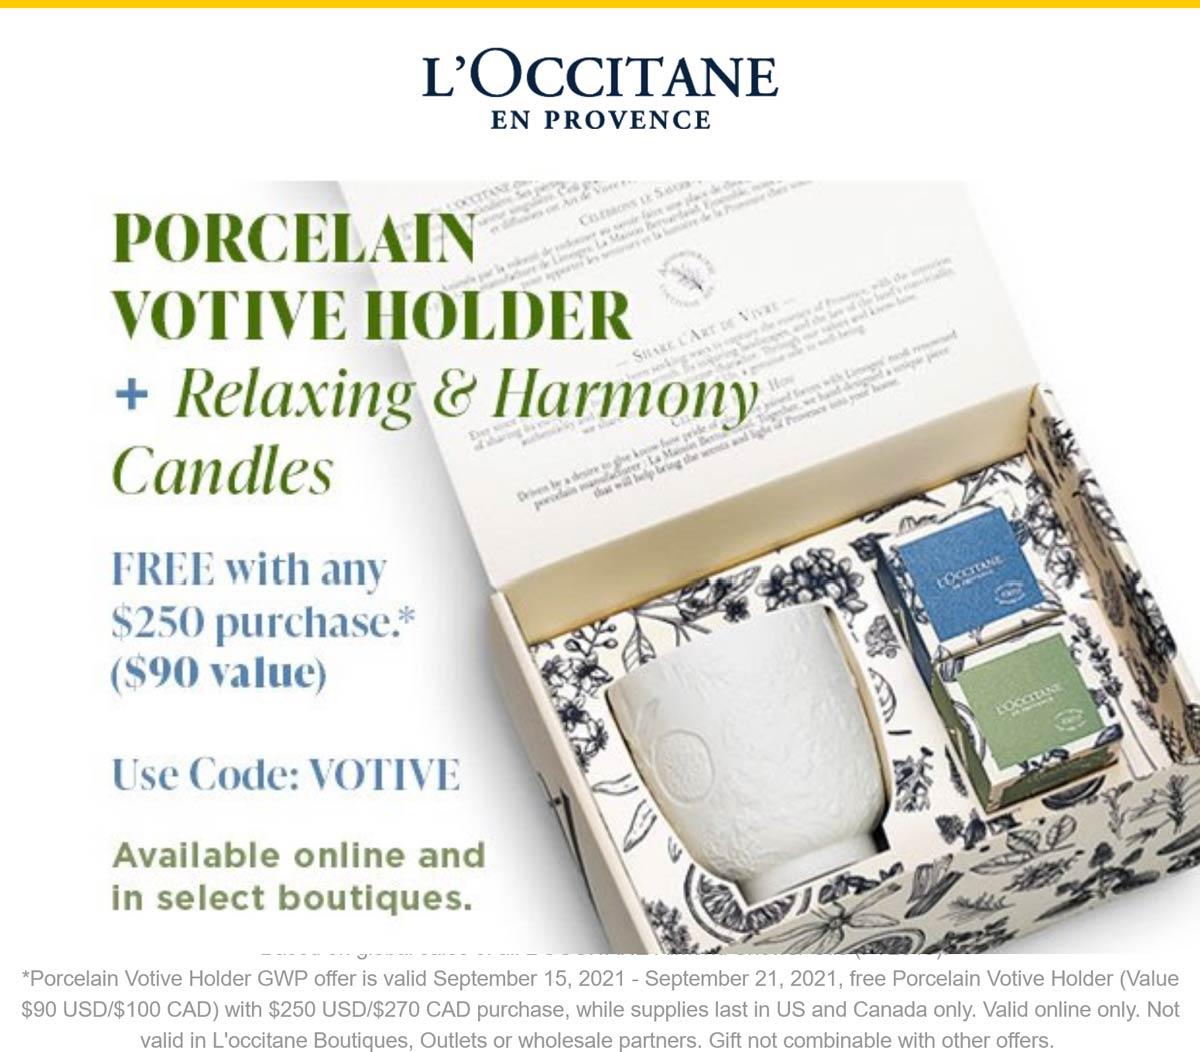 LOccitane stores Coupon  Free porcelain holder & candle set with $250 spent online at LOccitane via promo code VOTIVE #loccitane